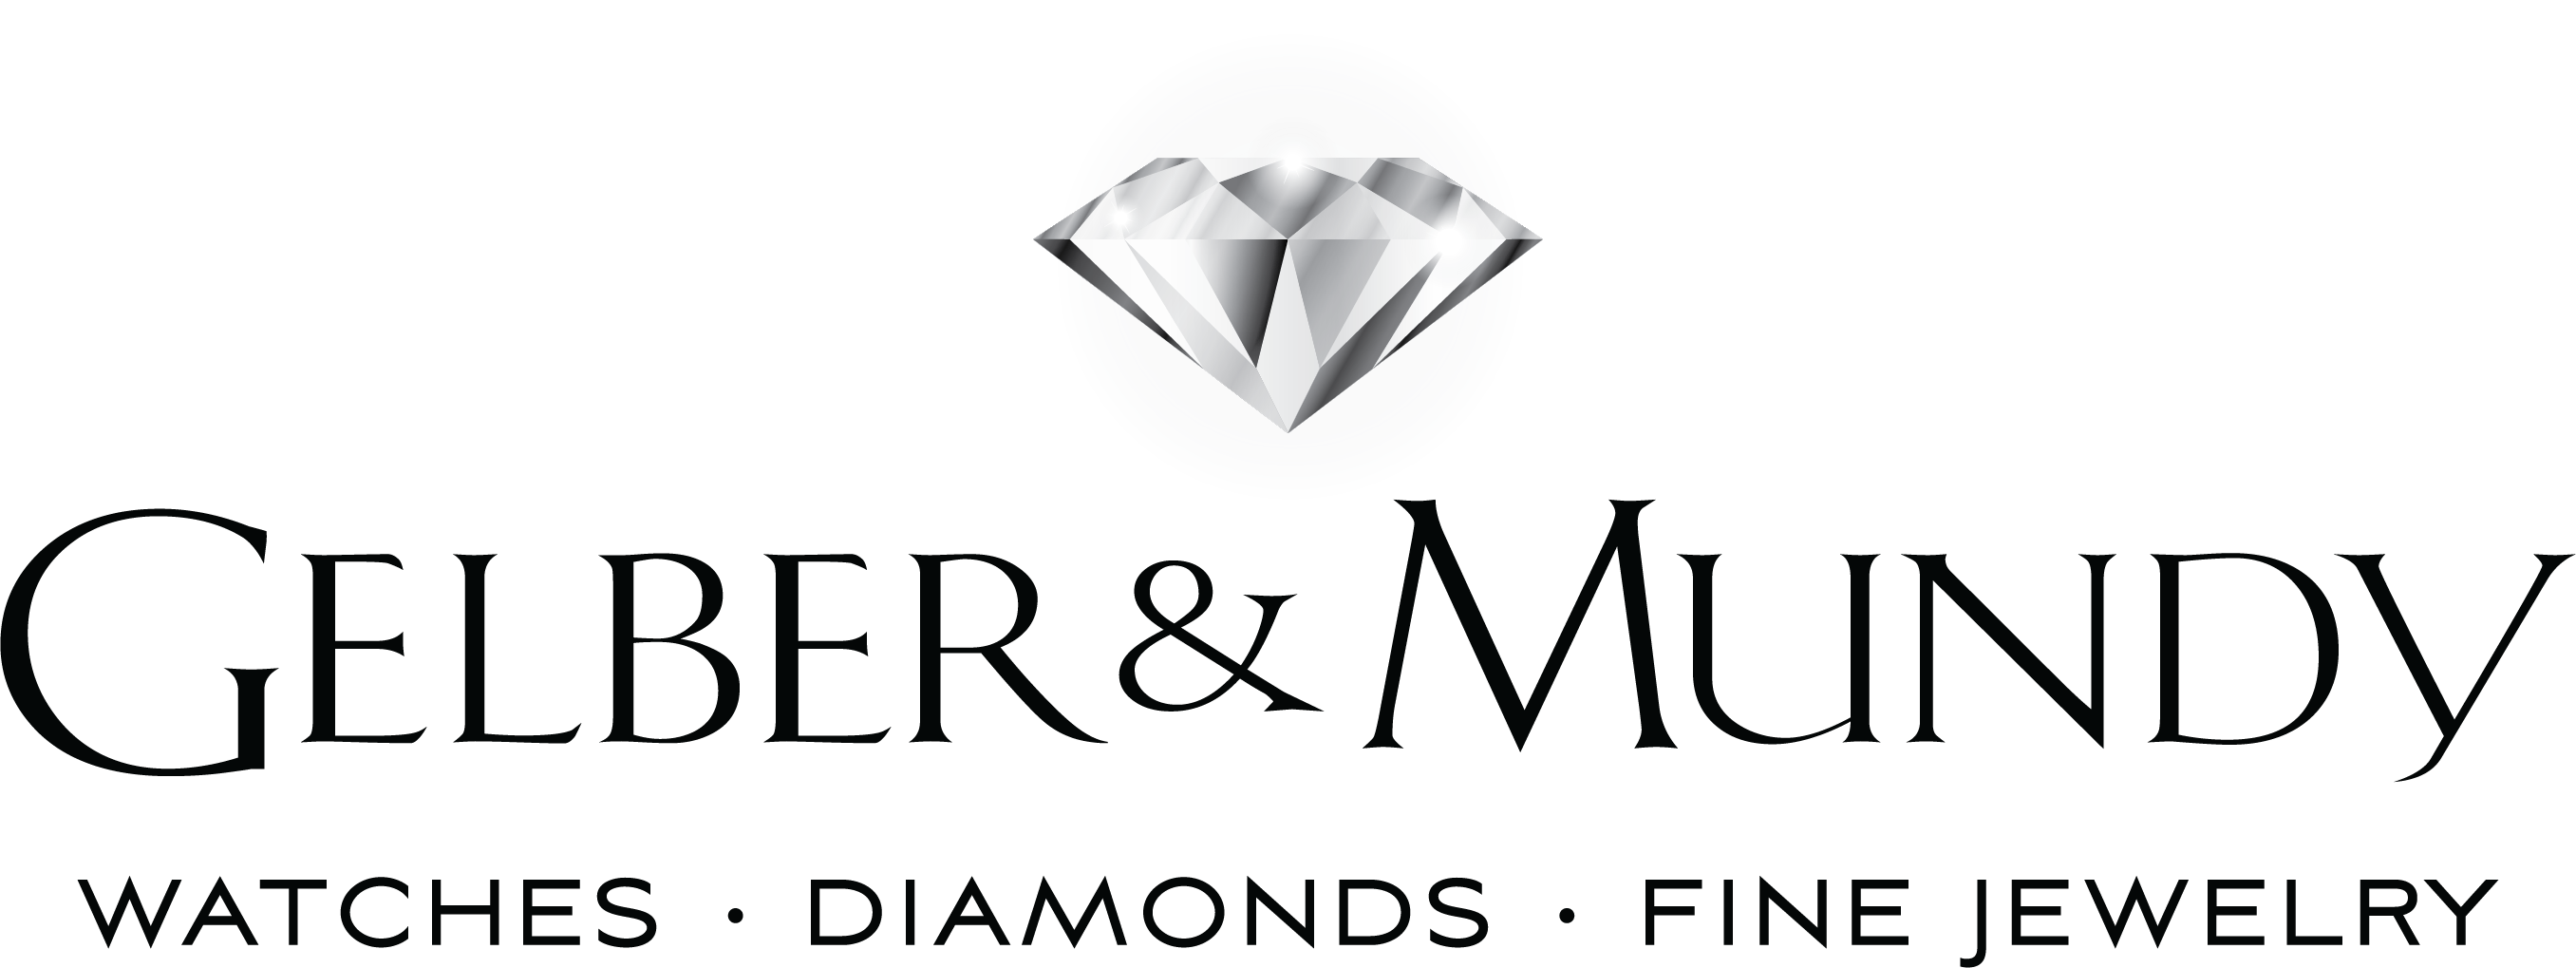 Gelber & Mundy Jewelry Co. Inc.